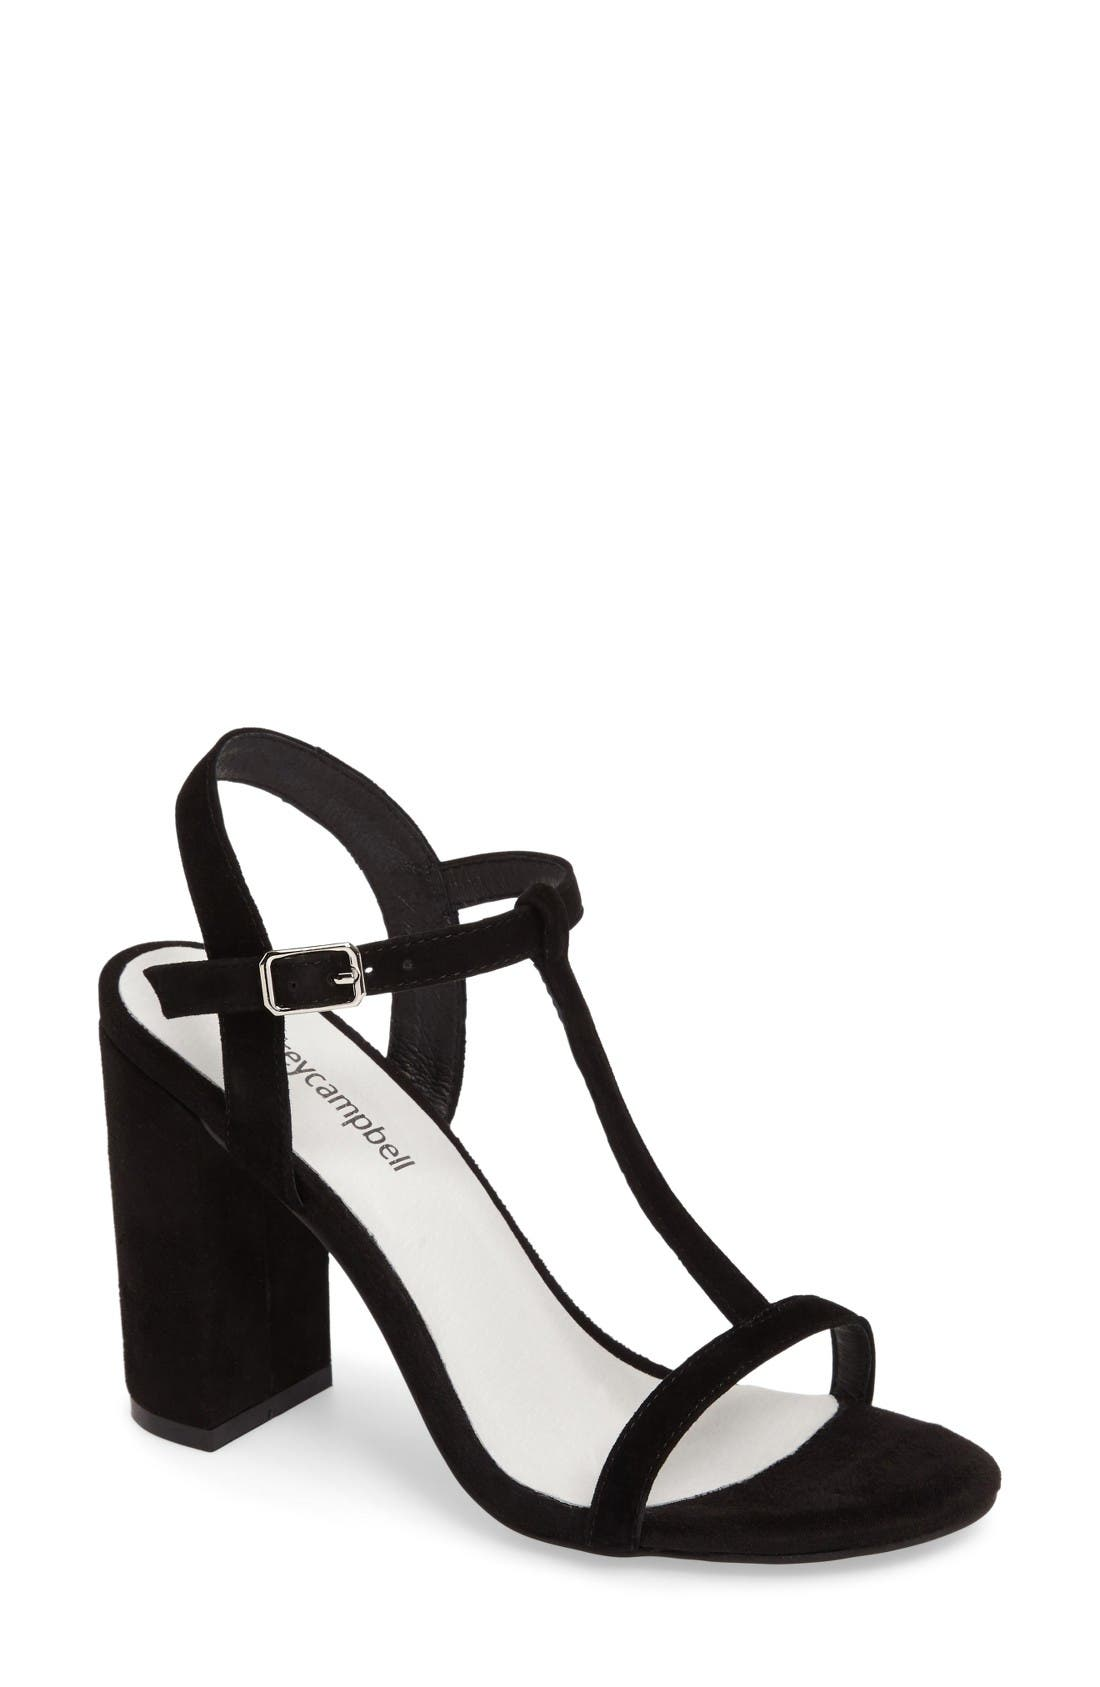 Alternate Image 1 Selected - Jeffrey Campbell Marnie T-Strap Sandal (Women)